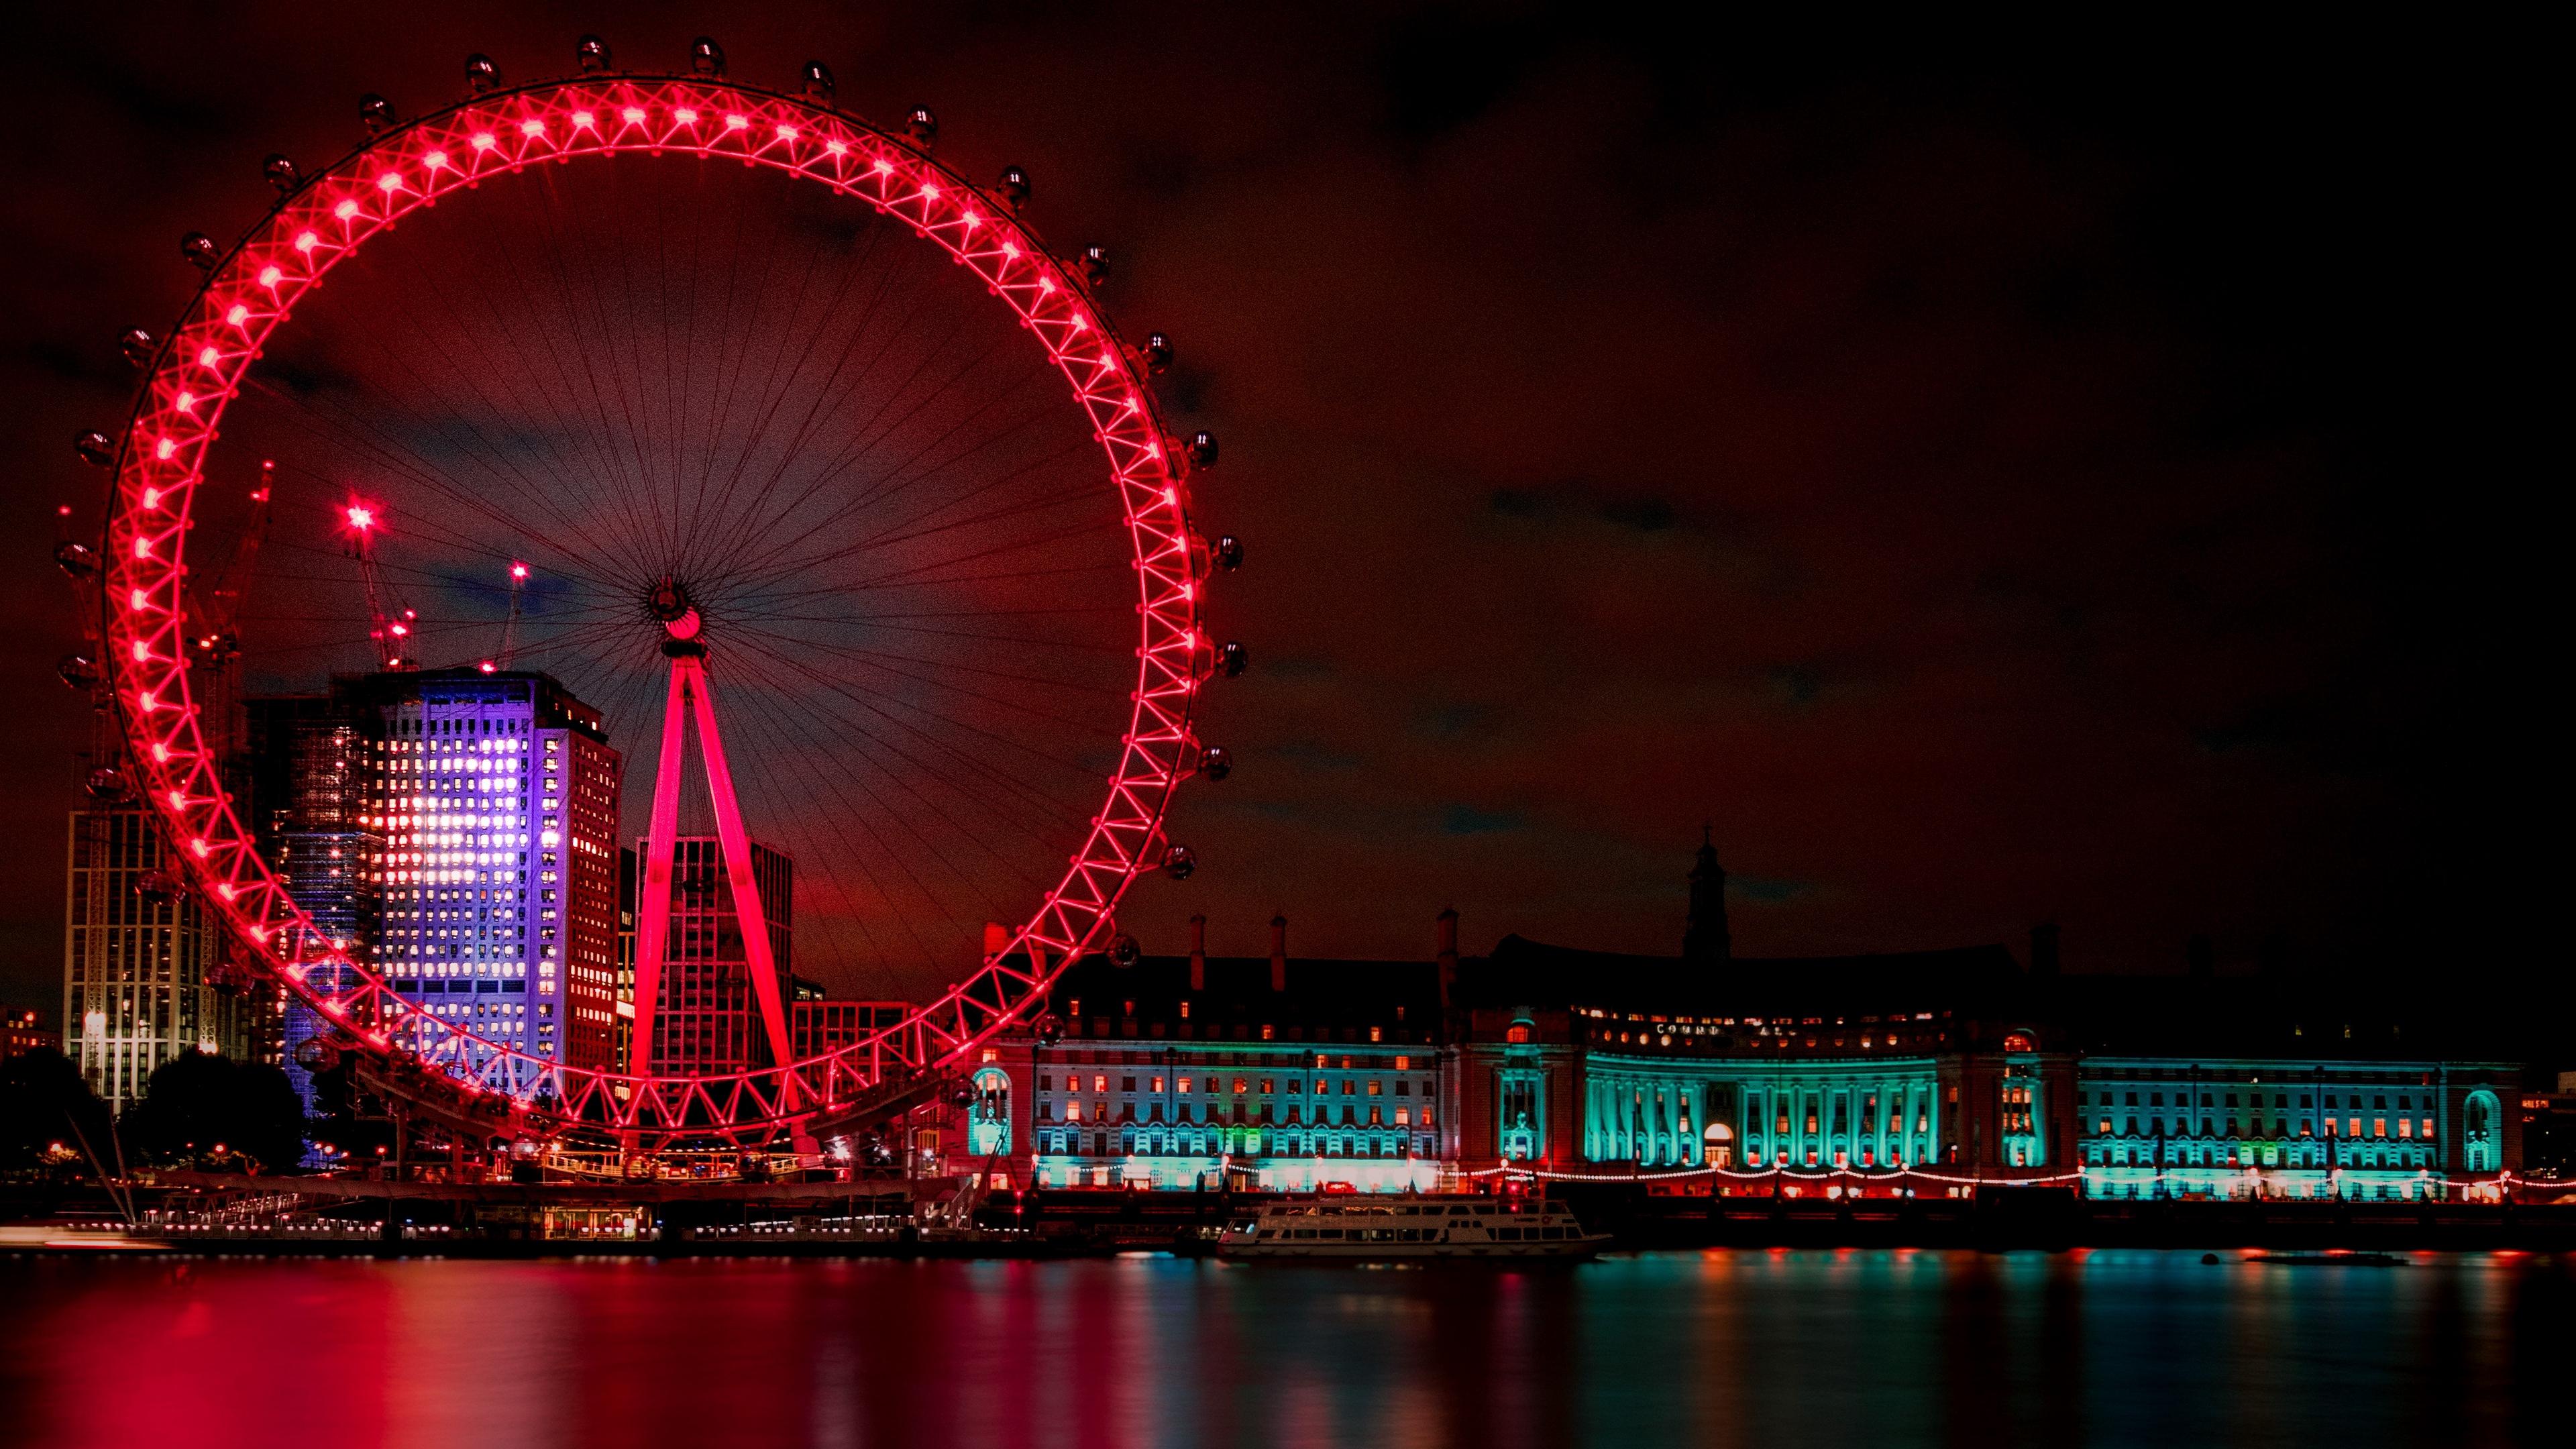 ferris wheel night city london united kingdom 4k 1538068159 - ferris wheel, night city, london, united kingdom 4k - night city, London, ferris wheel